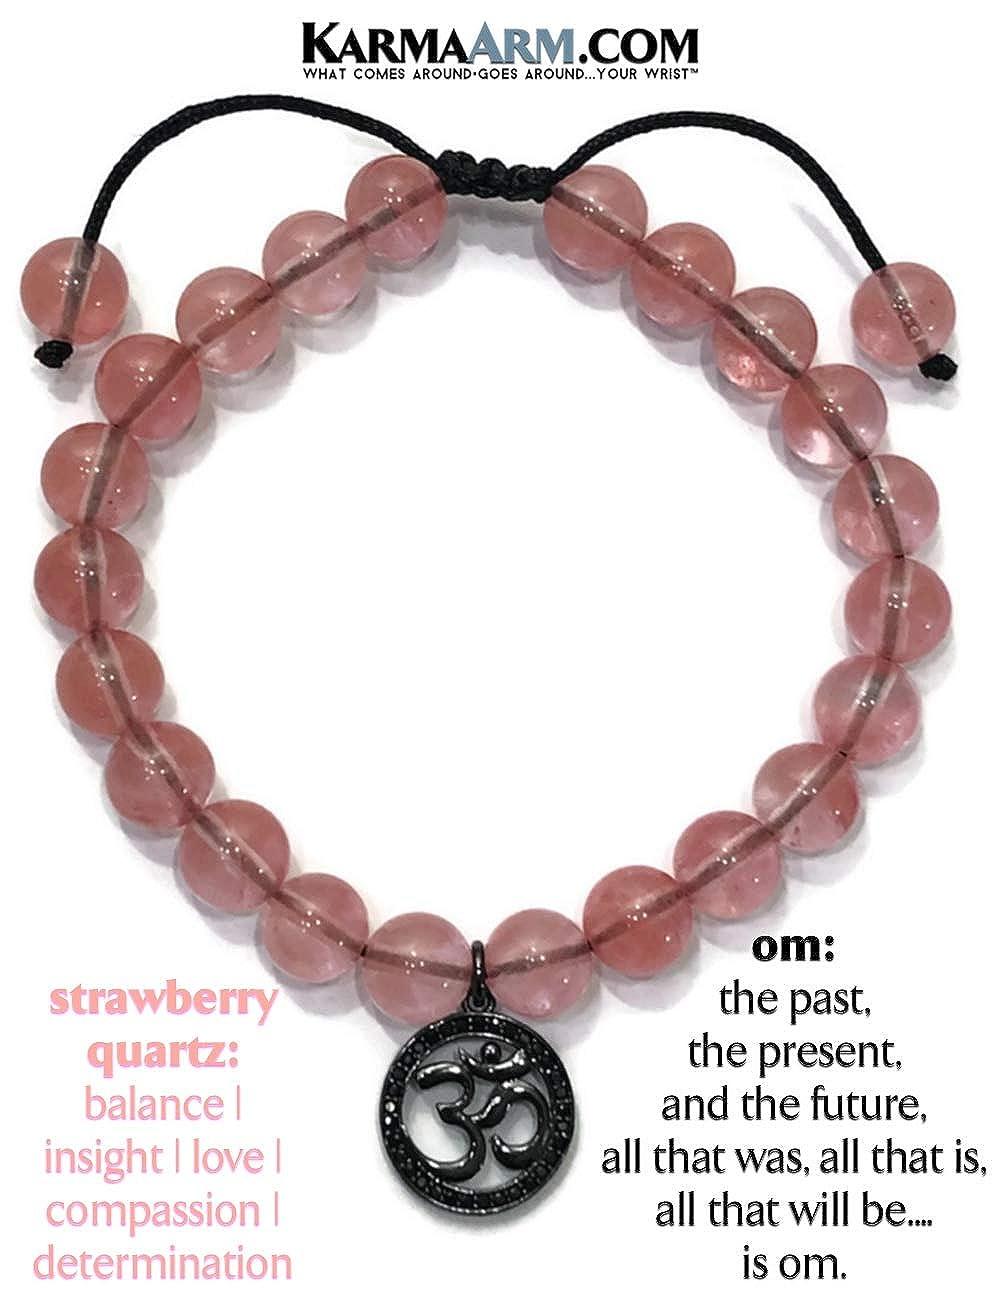 Gratitude Natural Strawberry Quartz Charm Bracelet Beaded Meditation Spiritual Stretch Mantra Reiki Healing Energy Boho Chakra Wrap Yoga Buddhist Jewelry /& Gemstone Gifts KarmaArm OM Bracelet